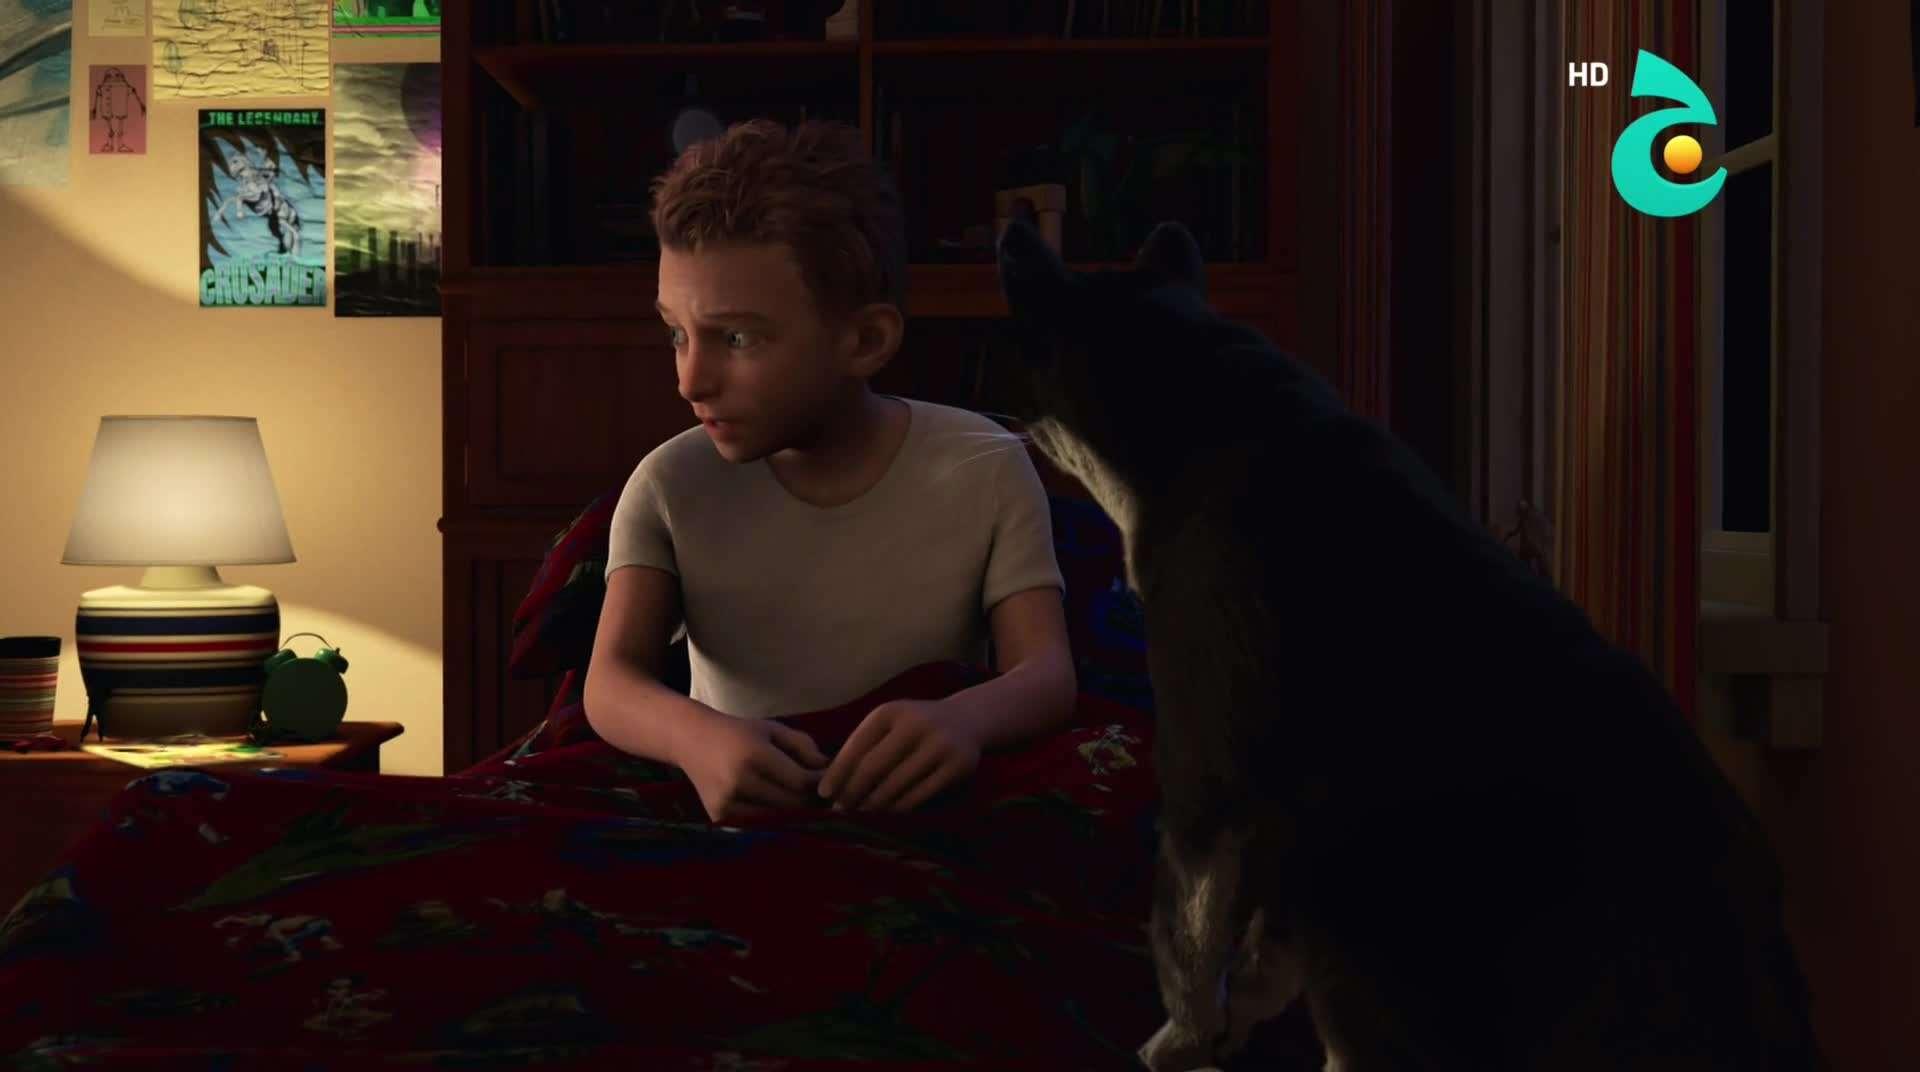 ميلو ورحلة الانقاذ Mars Needs Moms (2011) HDTV 1080p تحميل تورنت 4 arabp2p.com